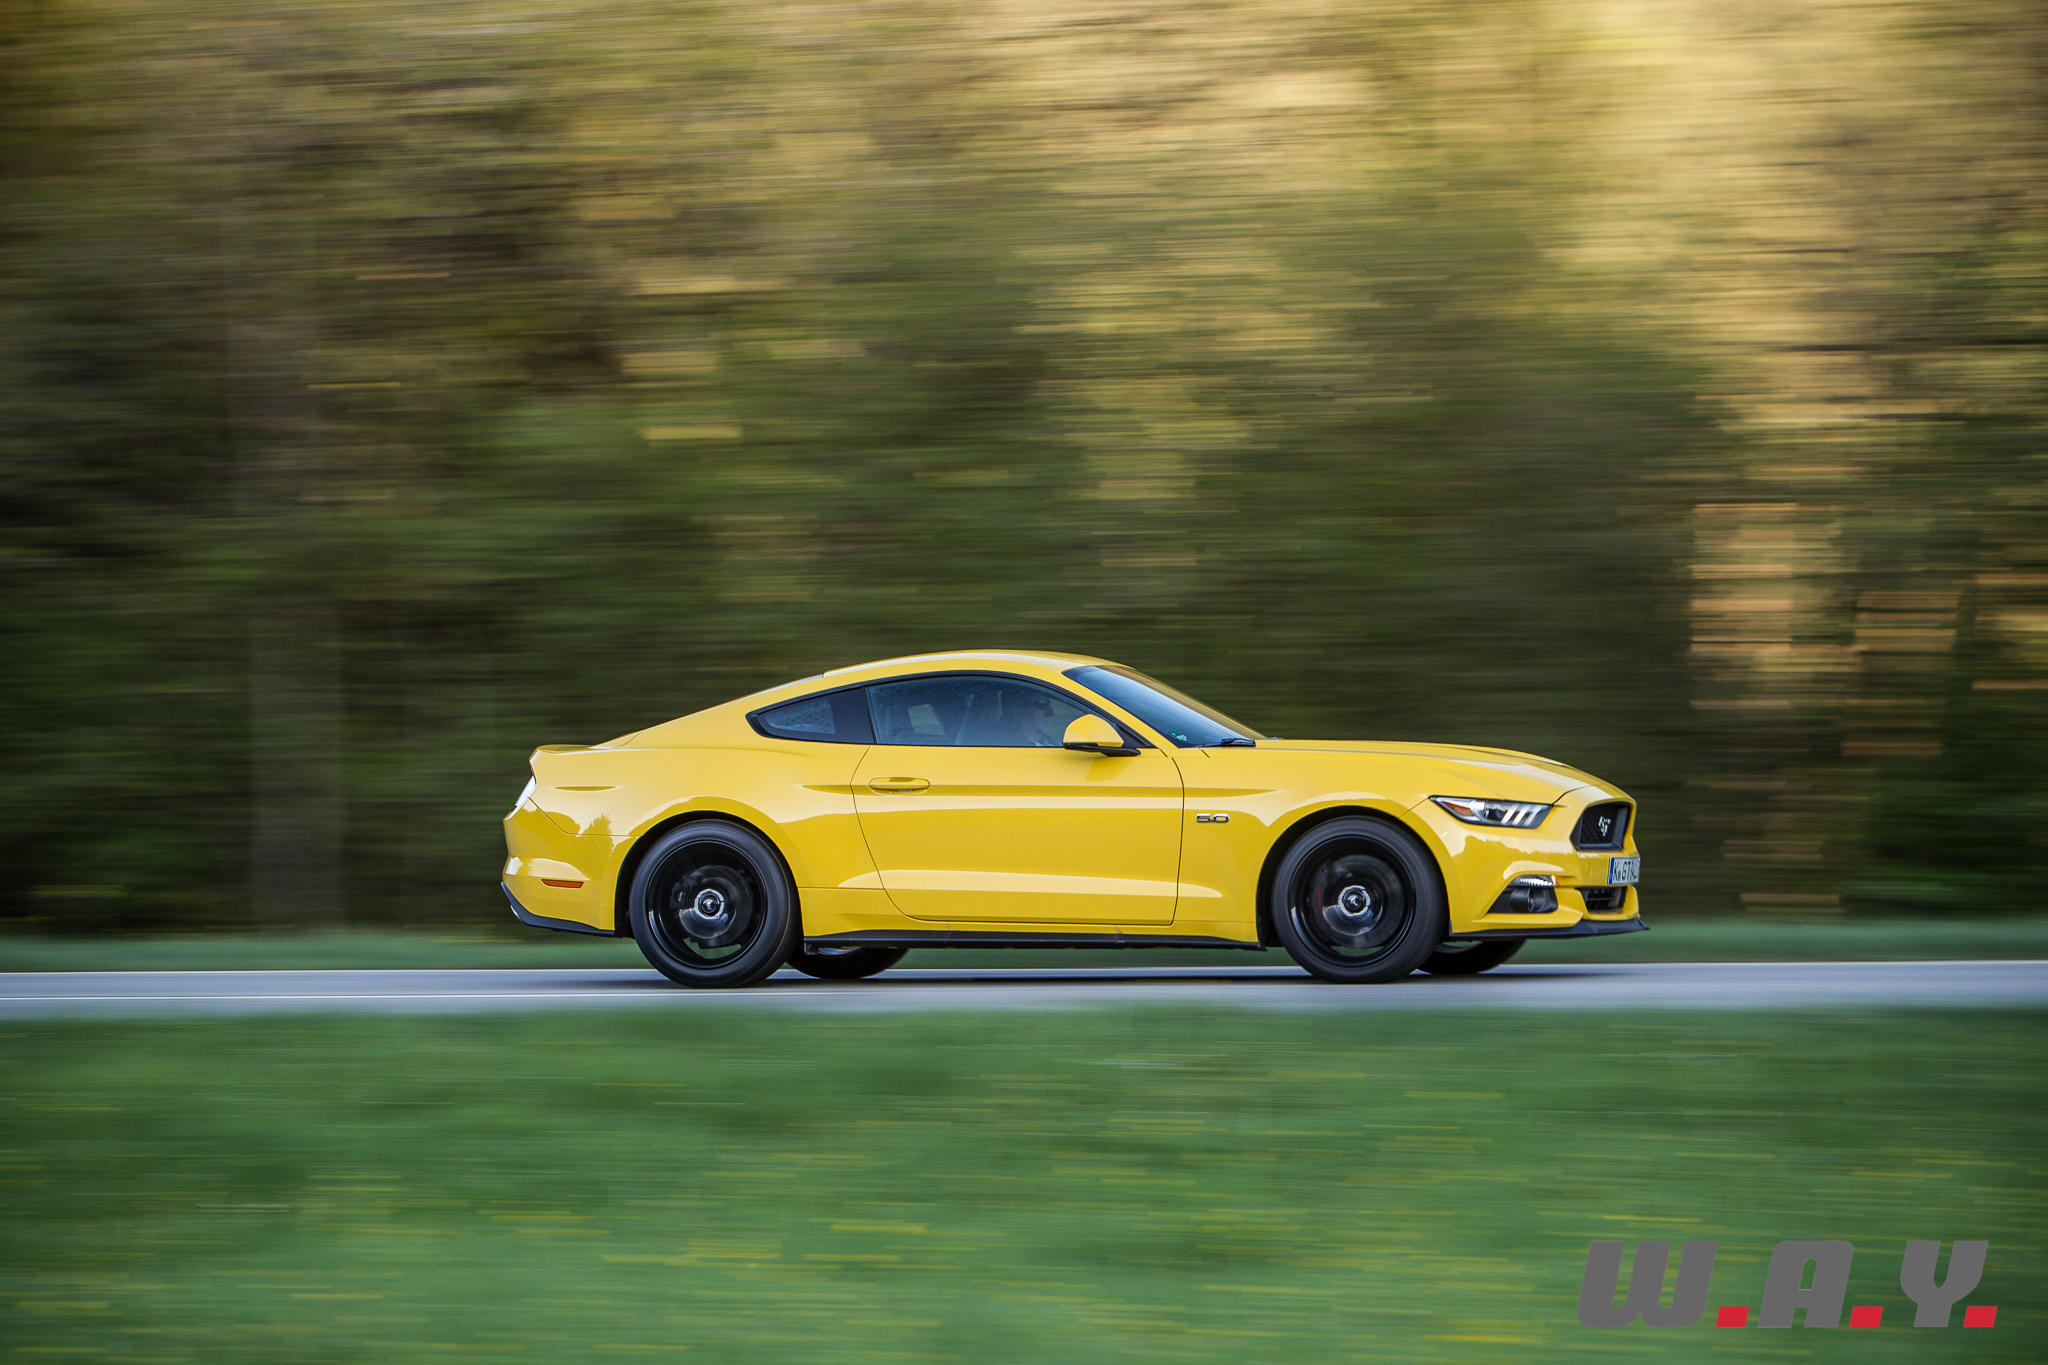 Mustang-05